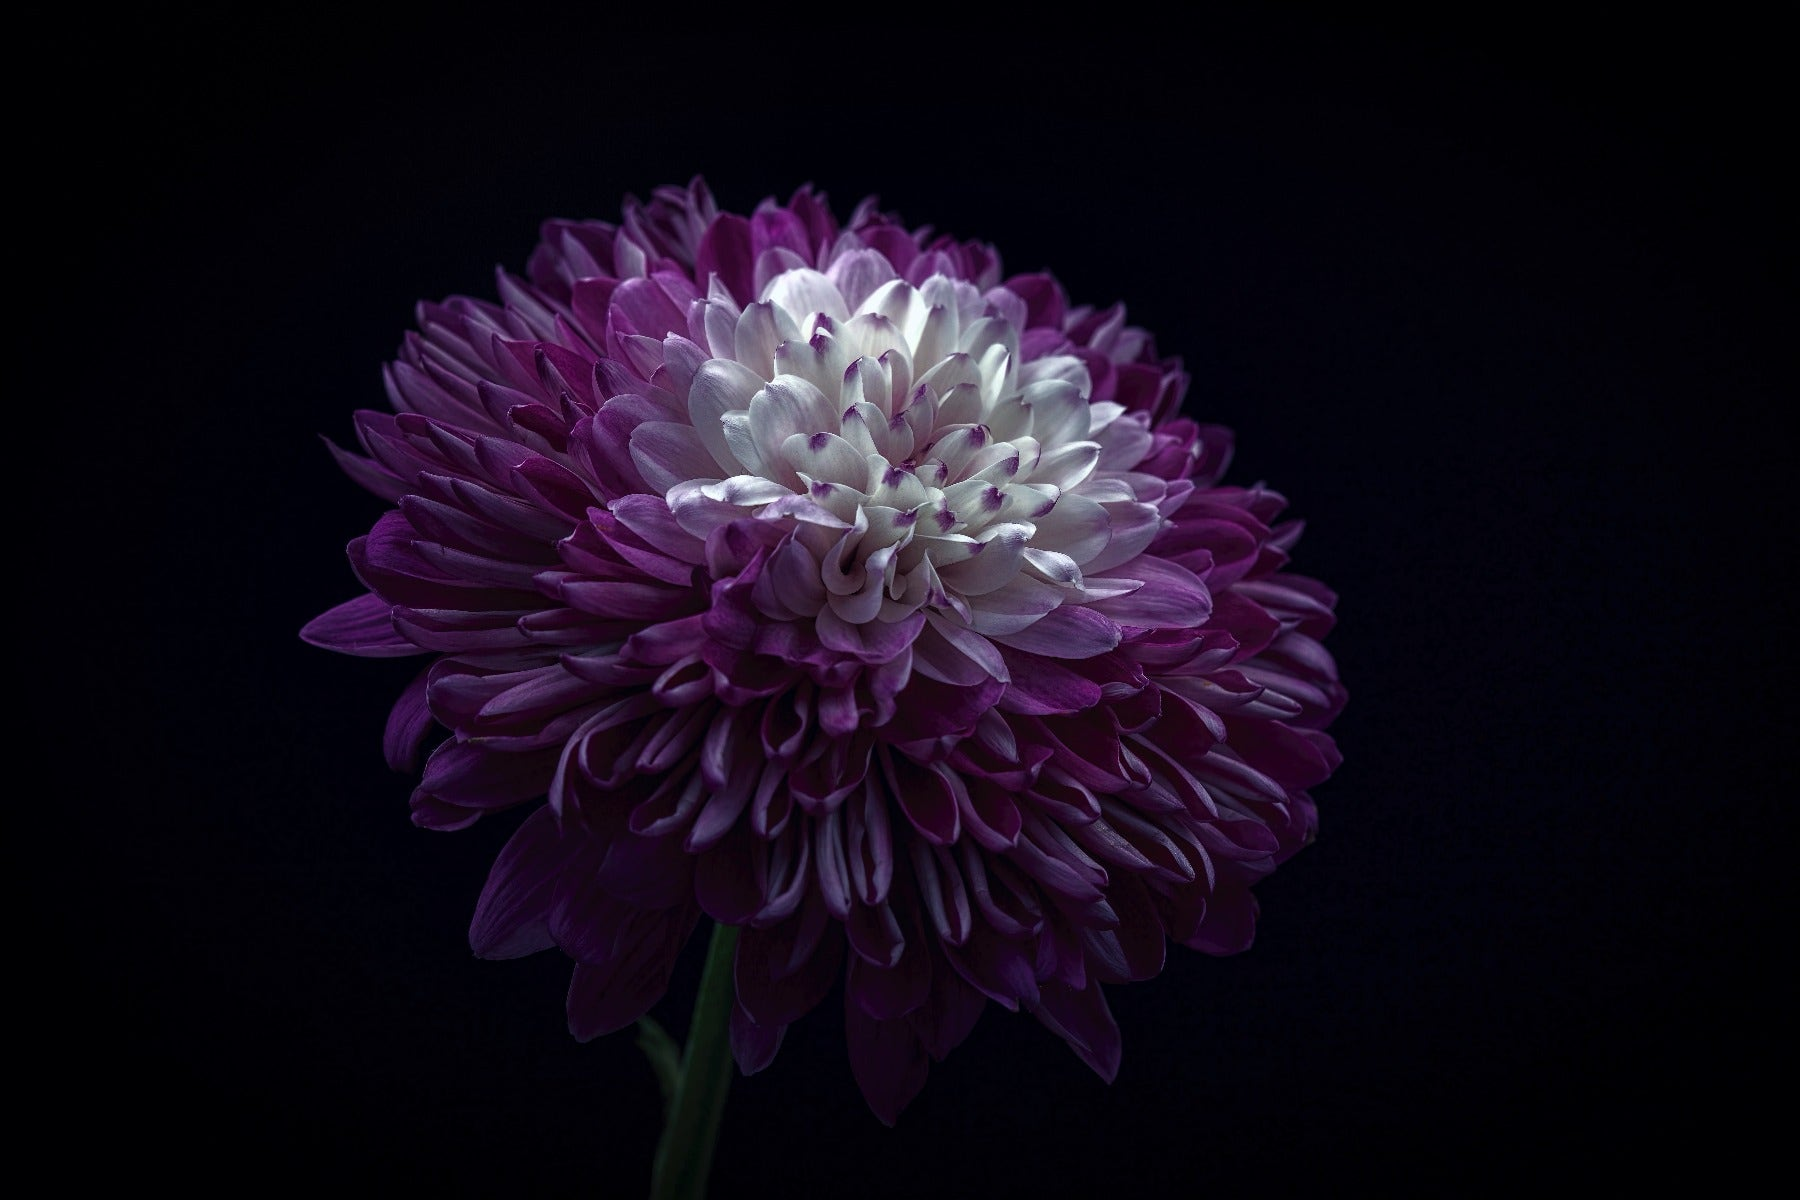 Purple flower with dark lighting